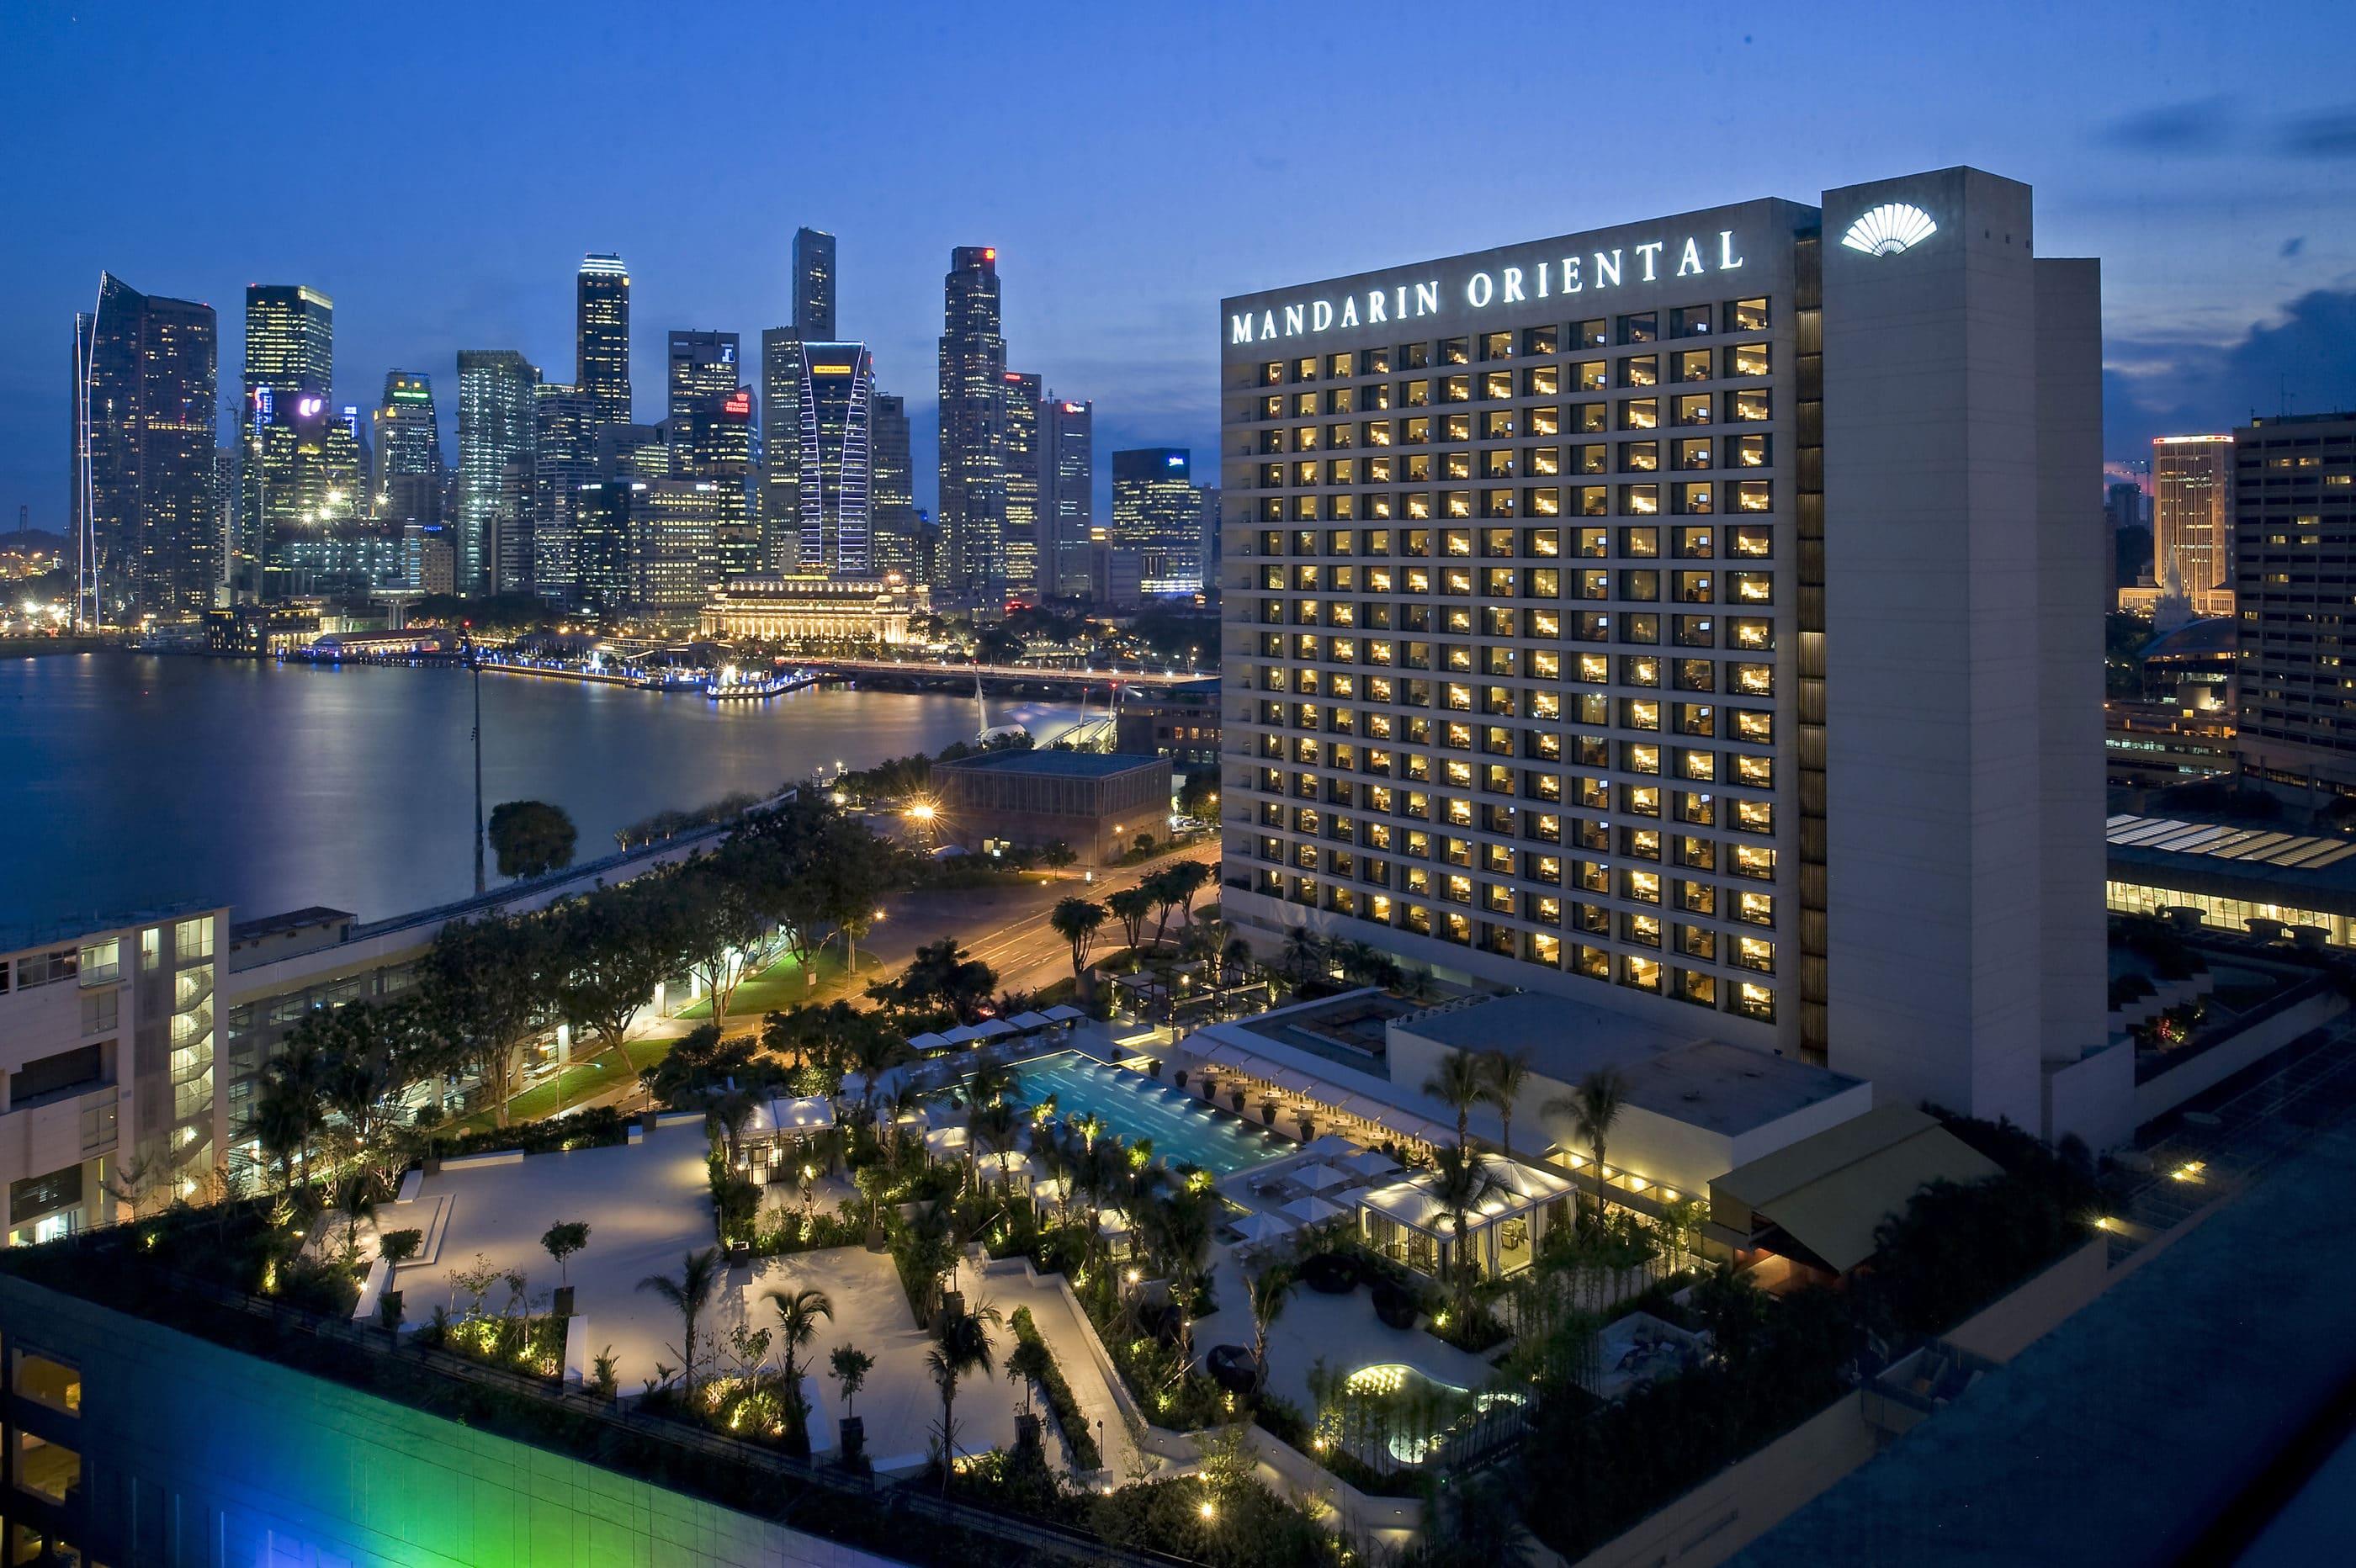 Mandarin Oriental, Singapore a luxury hotel in Marina Bay